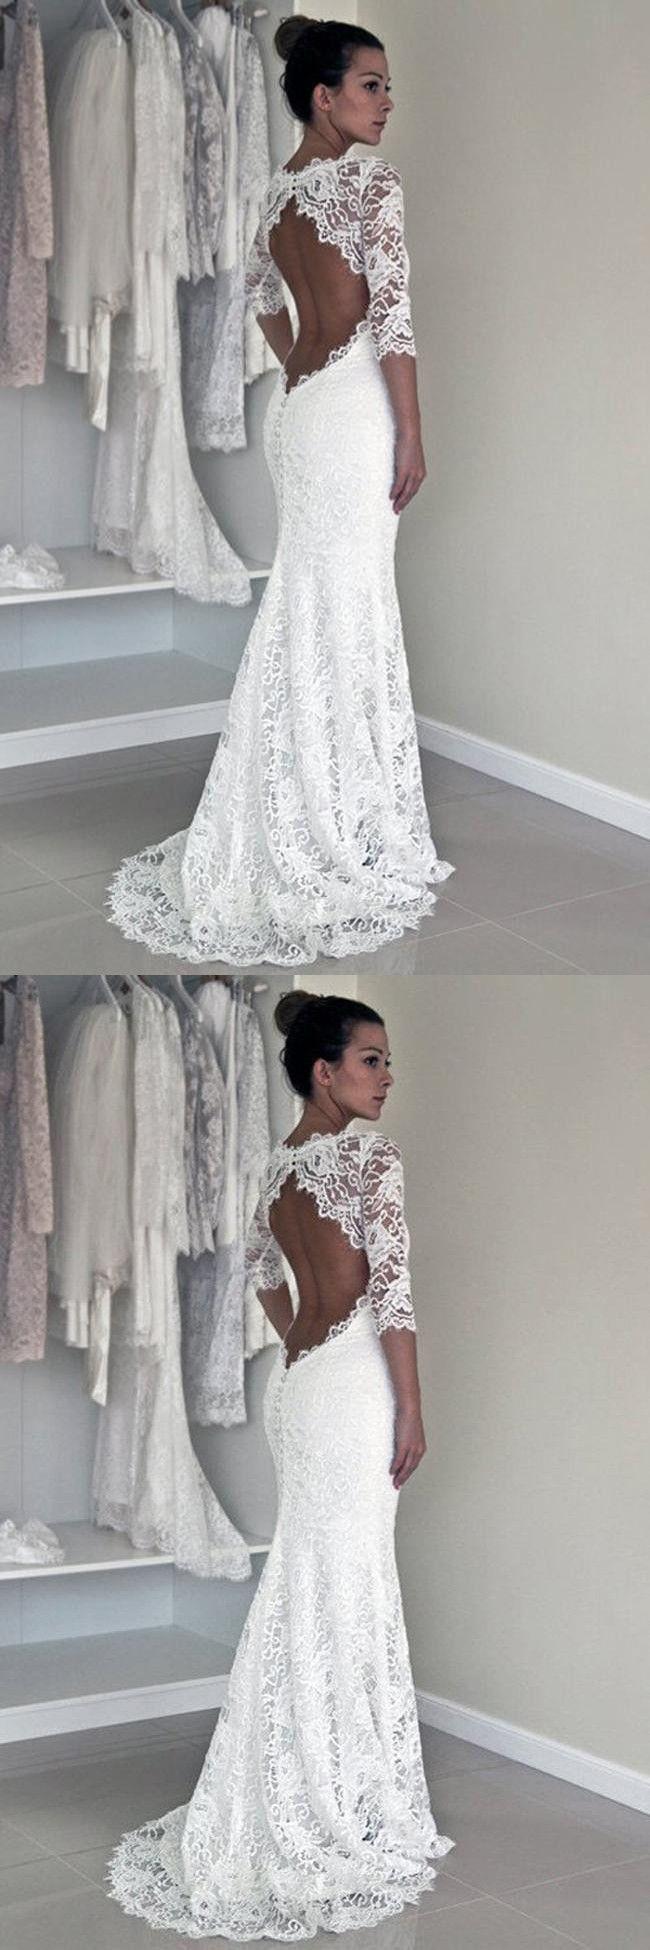 Wedding dress long sleeve  Long Wedding DressesCheap Wedding GownsLace Wedding DressesOpen